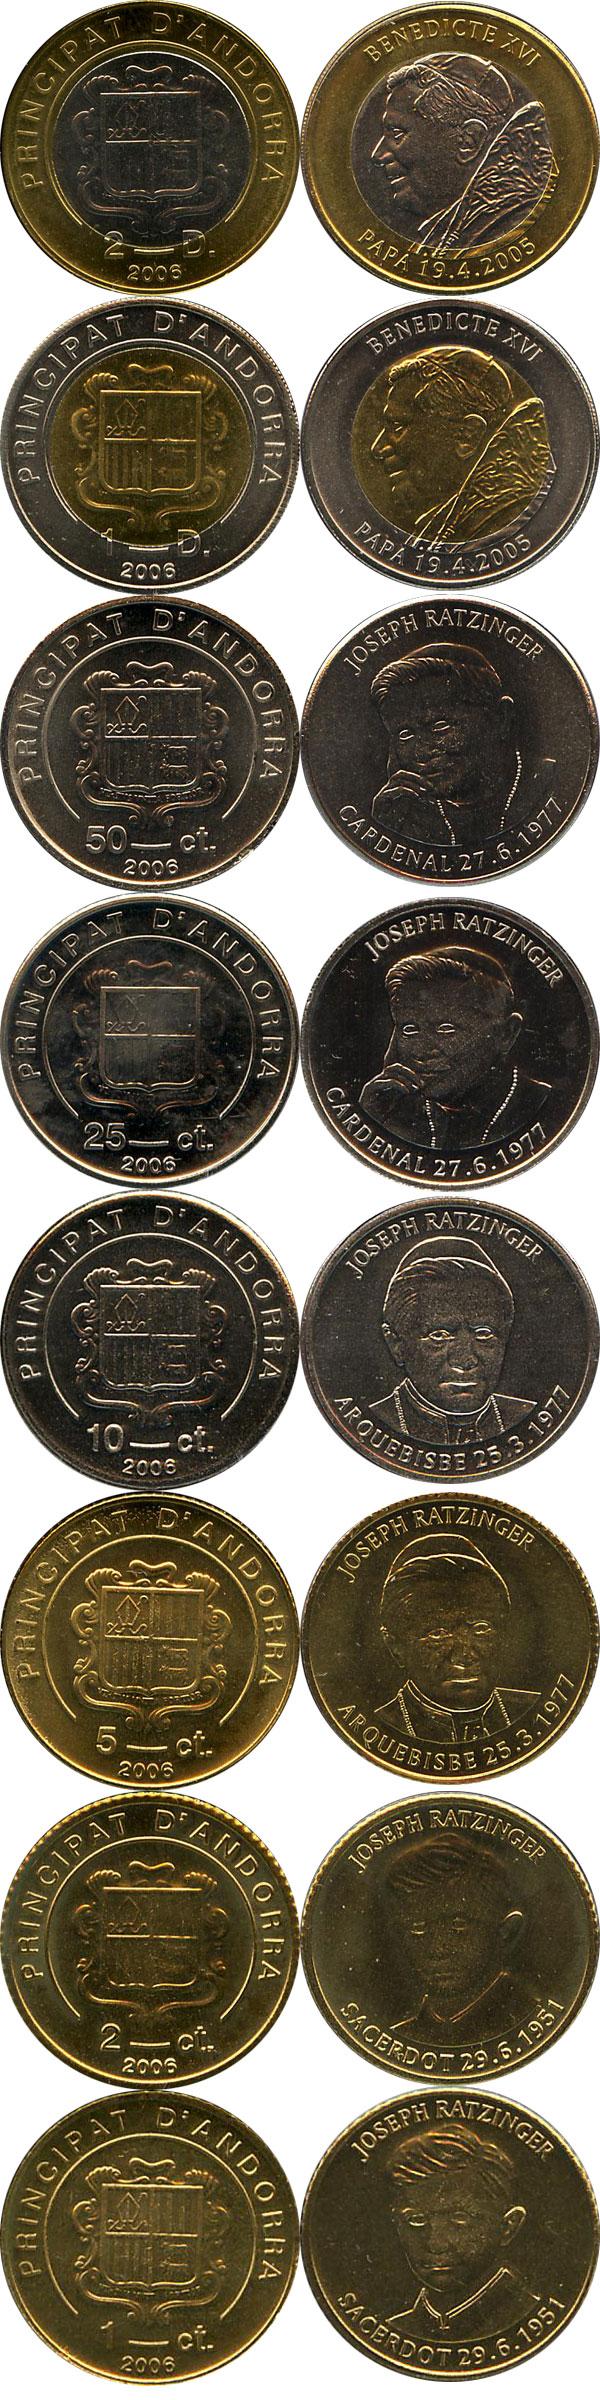 Картинка Подарочные монеты Андорра Бенедикт 16  2006